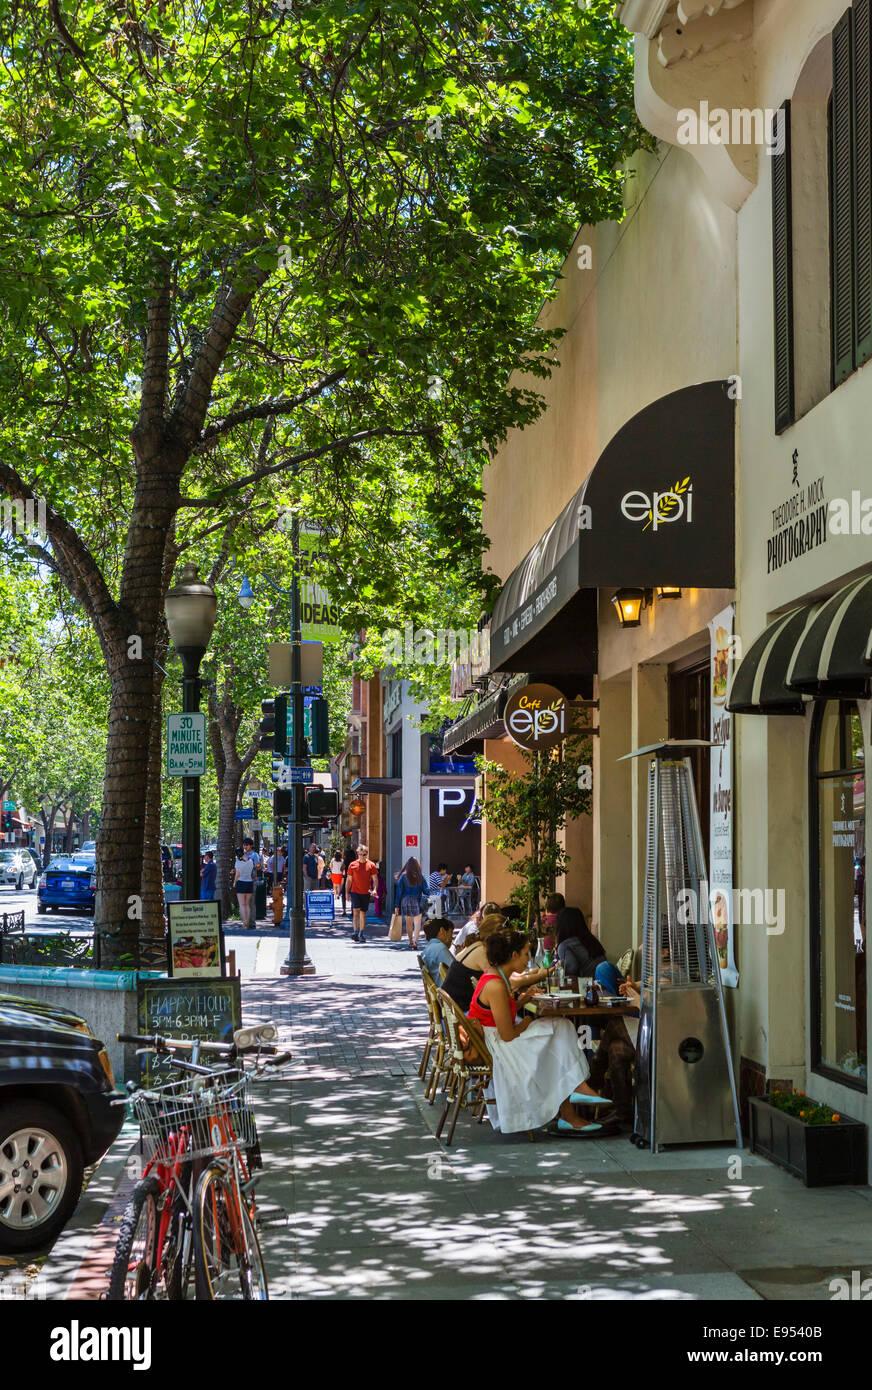 California Cafe Restaurant Palo Alto